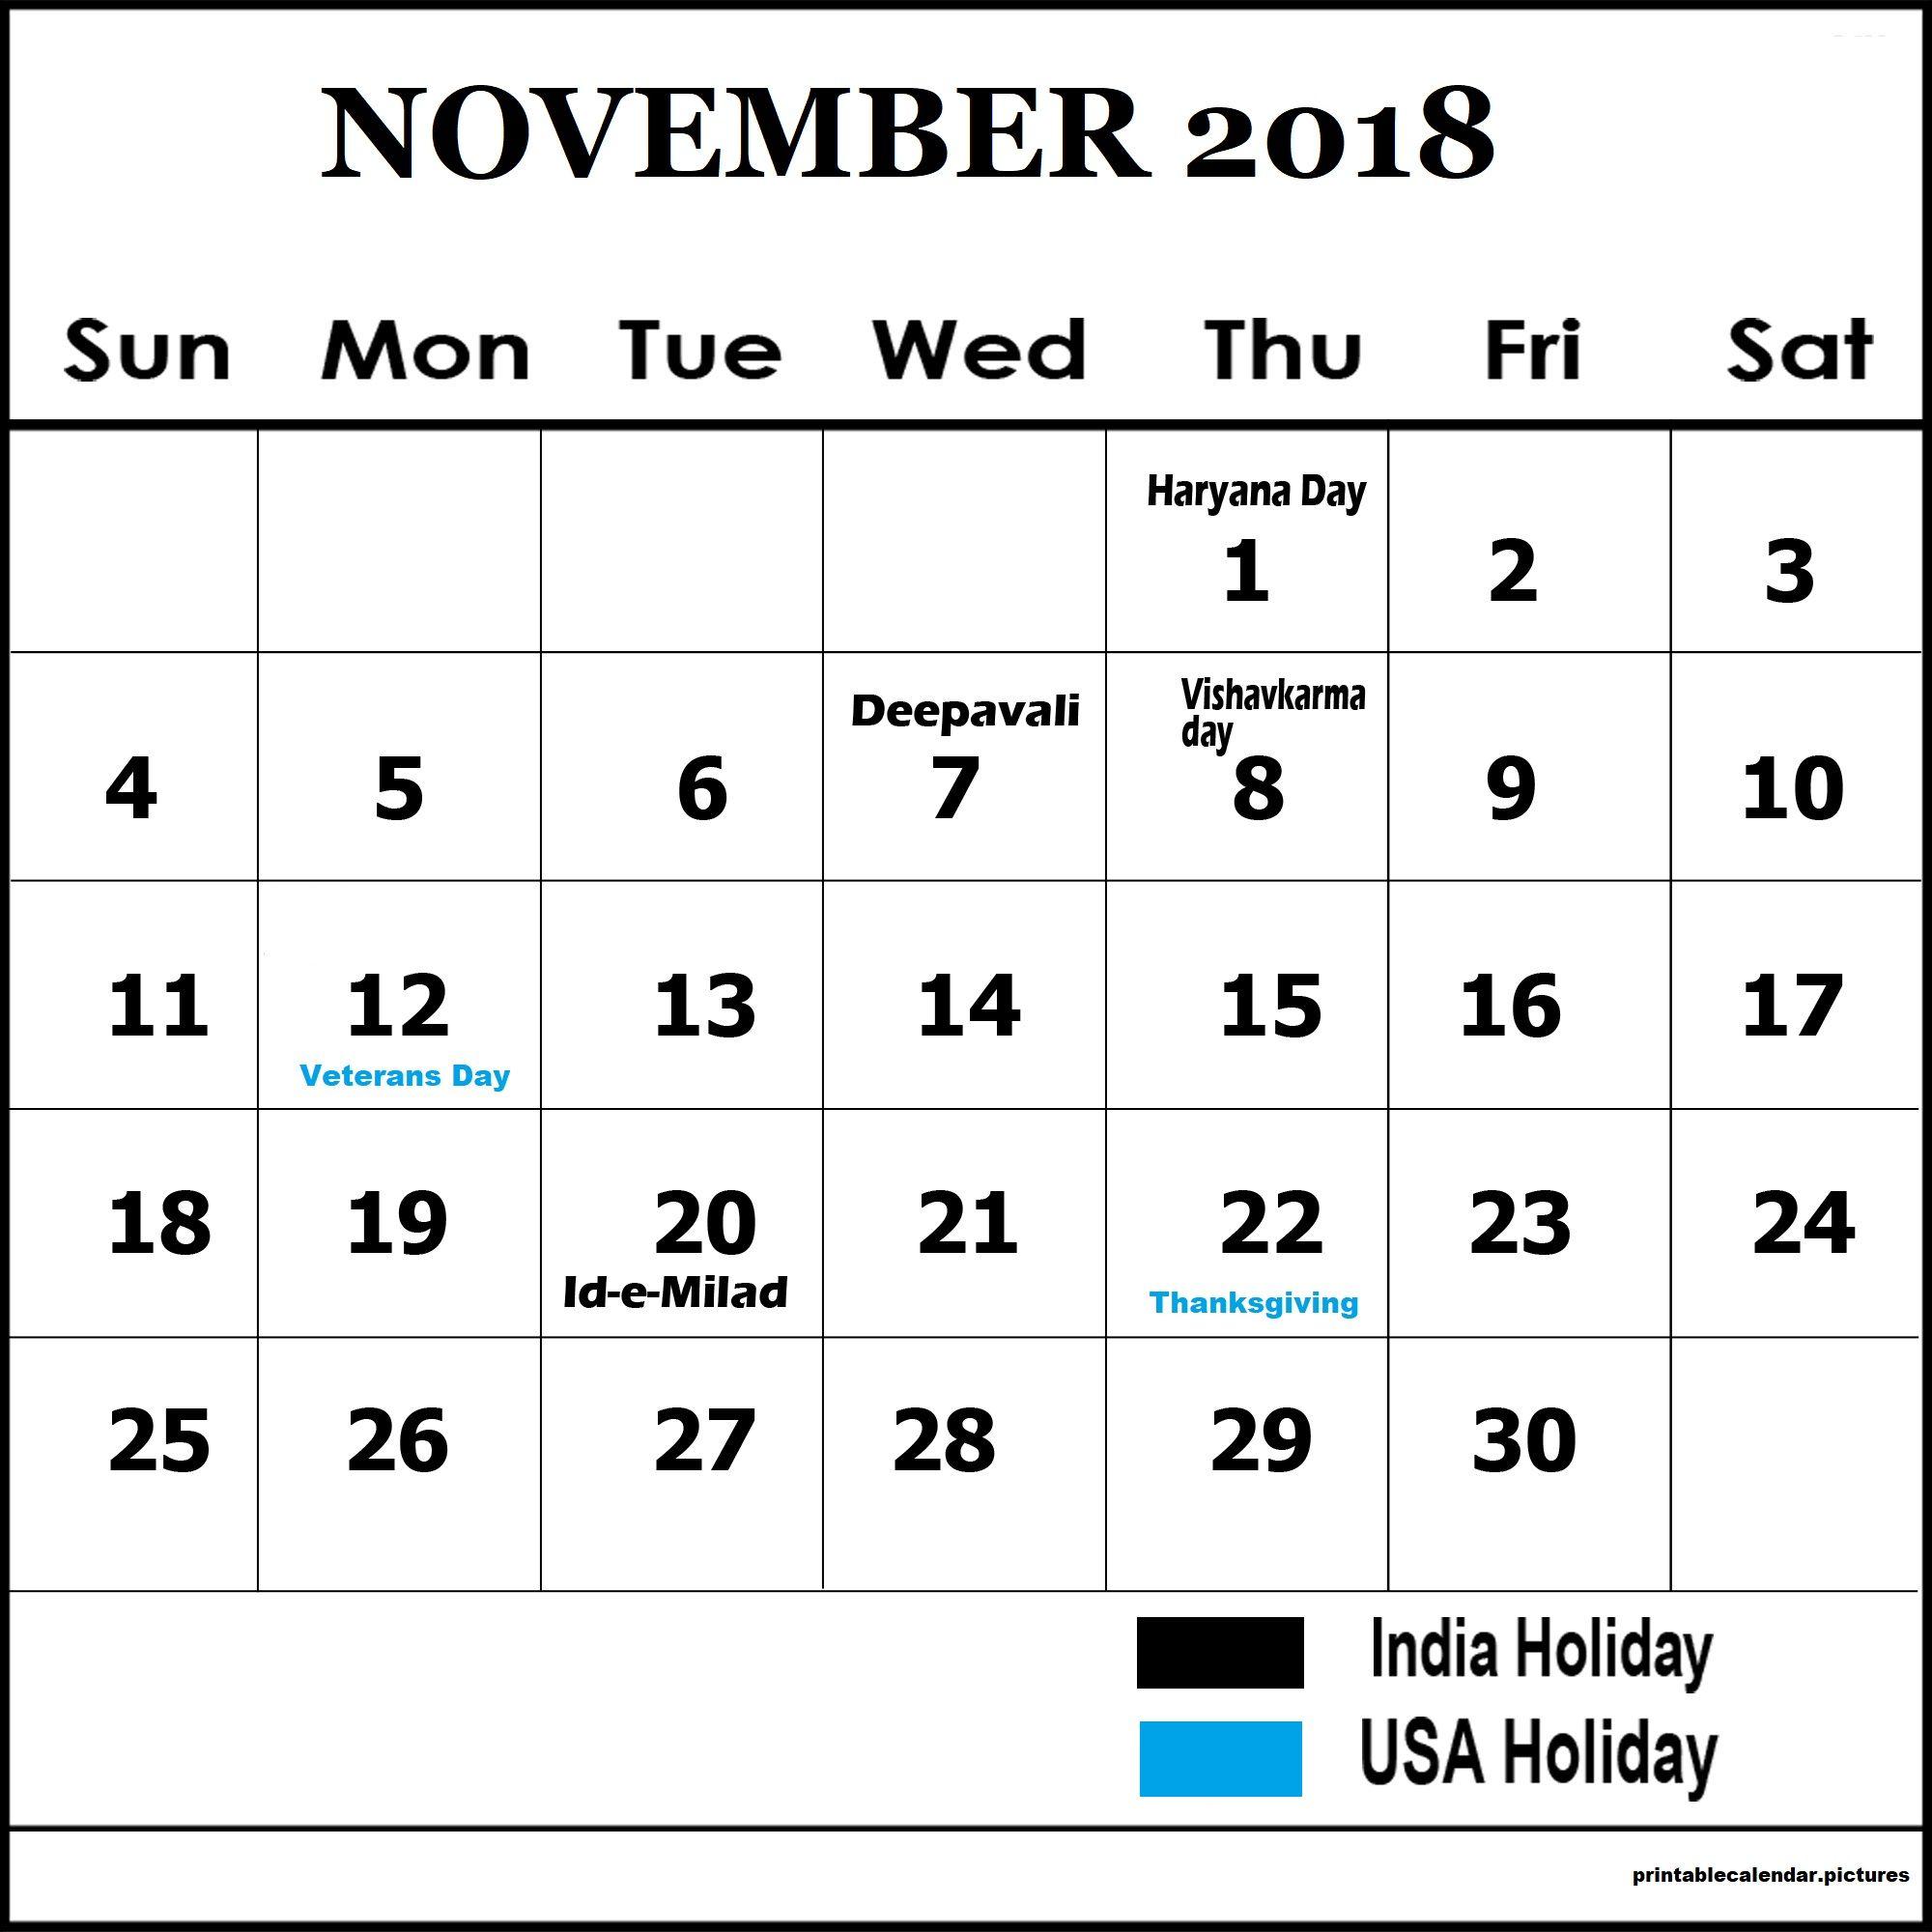 november 2018 calendar india holidays calendar holidays india november